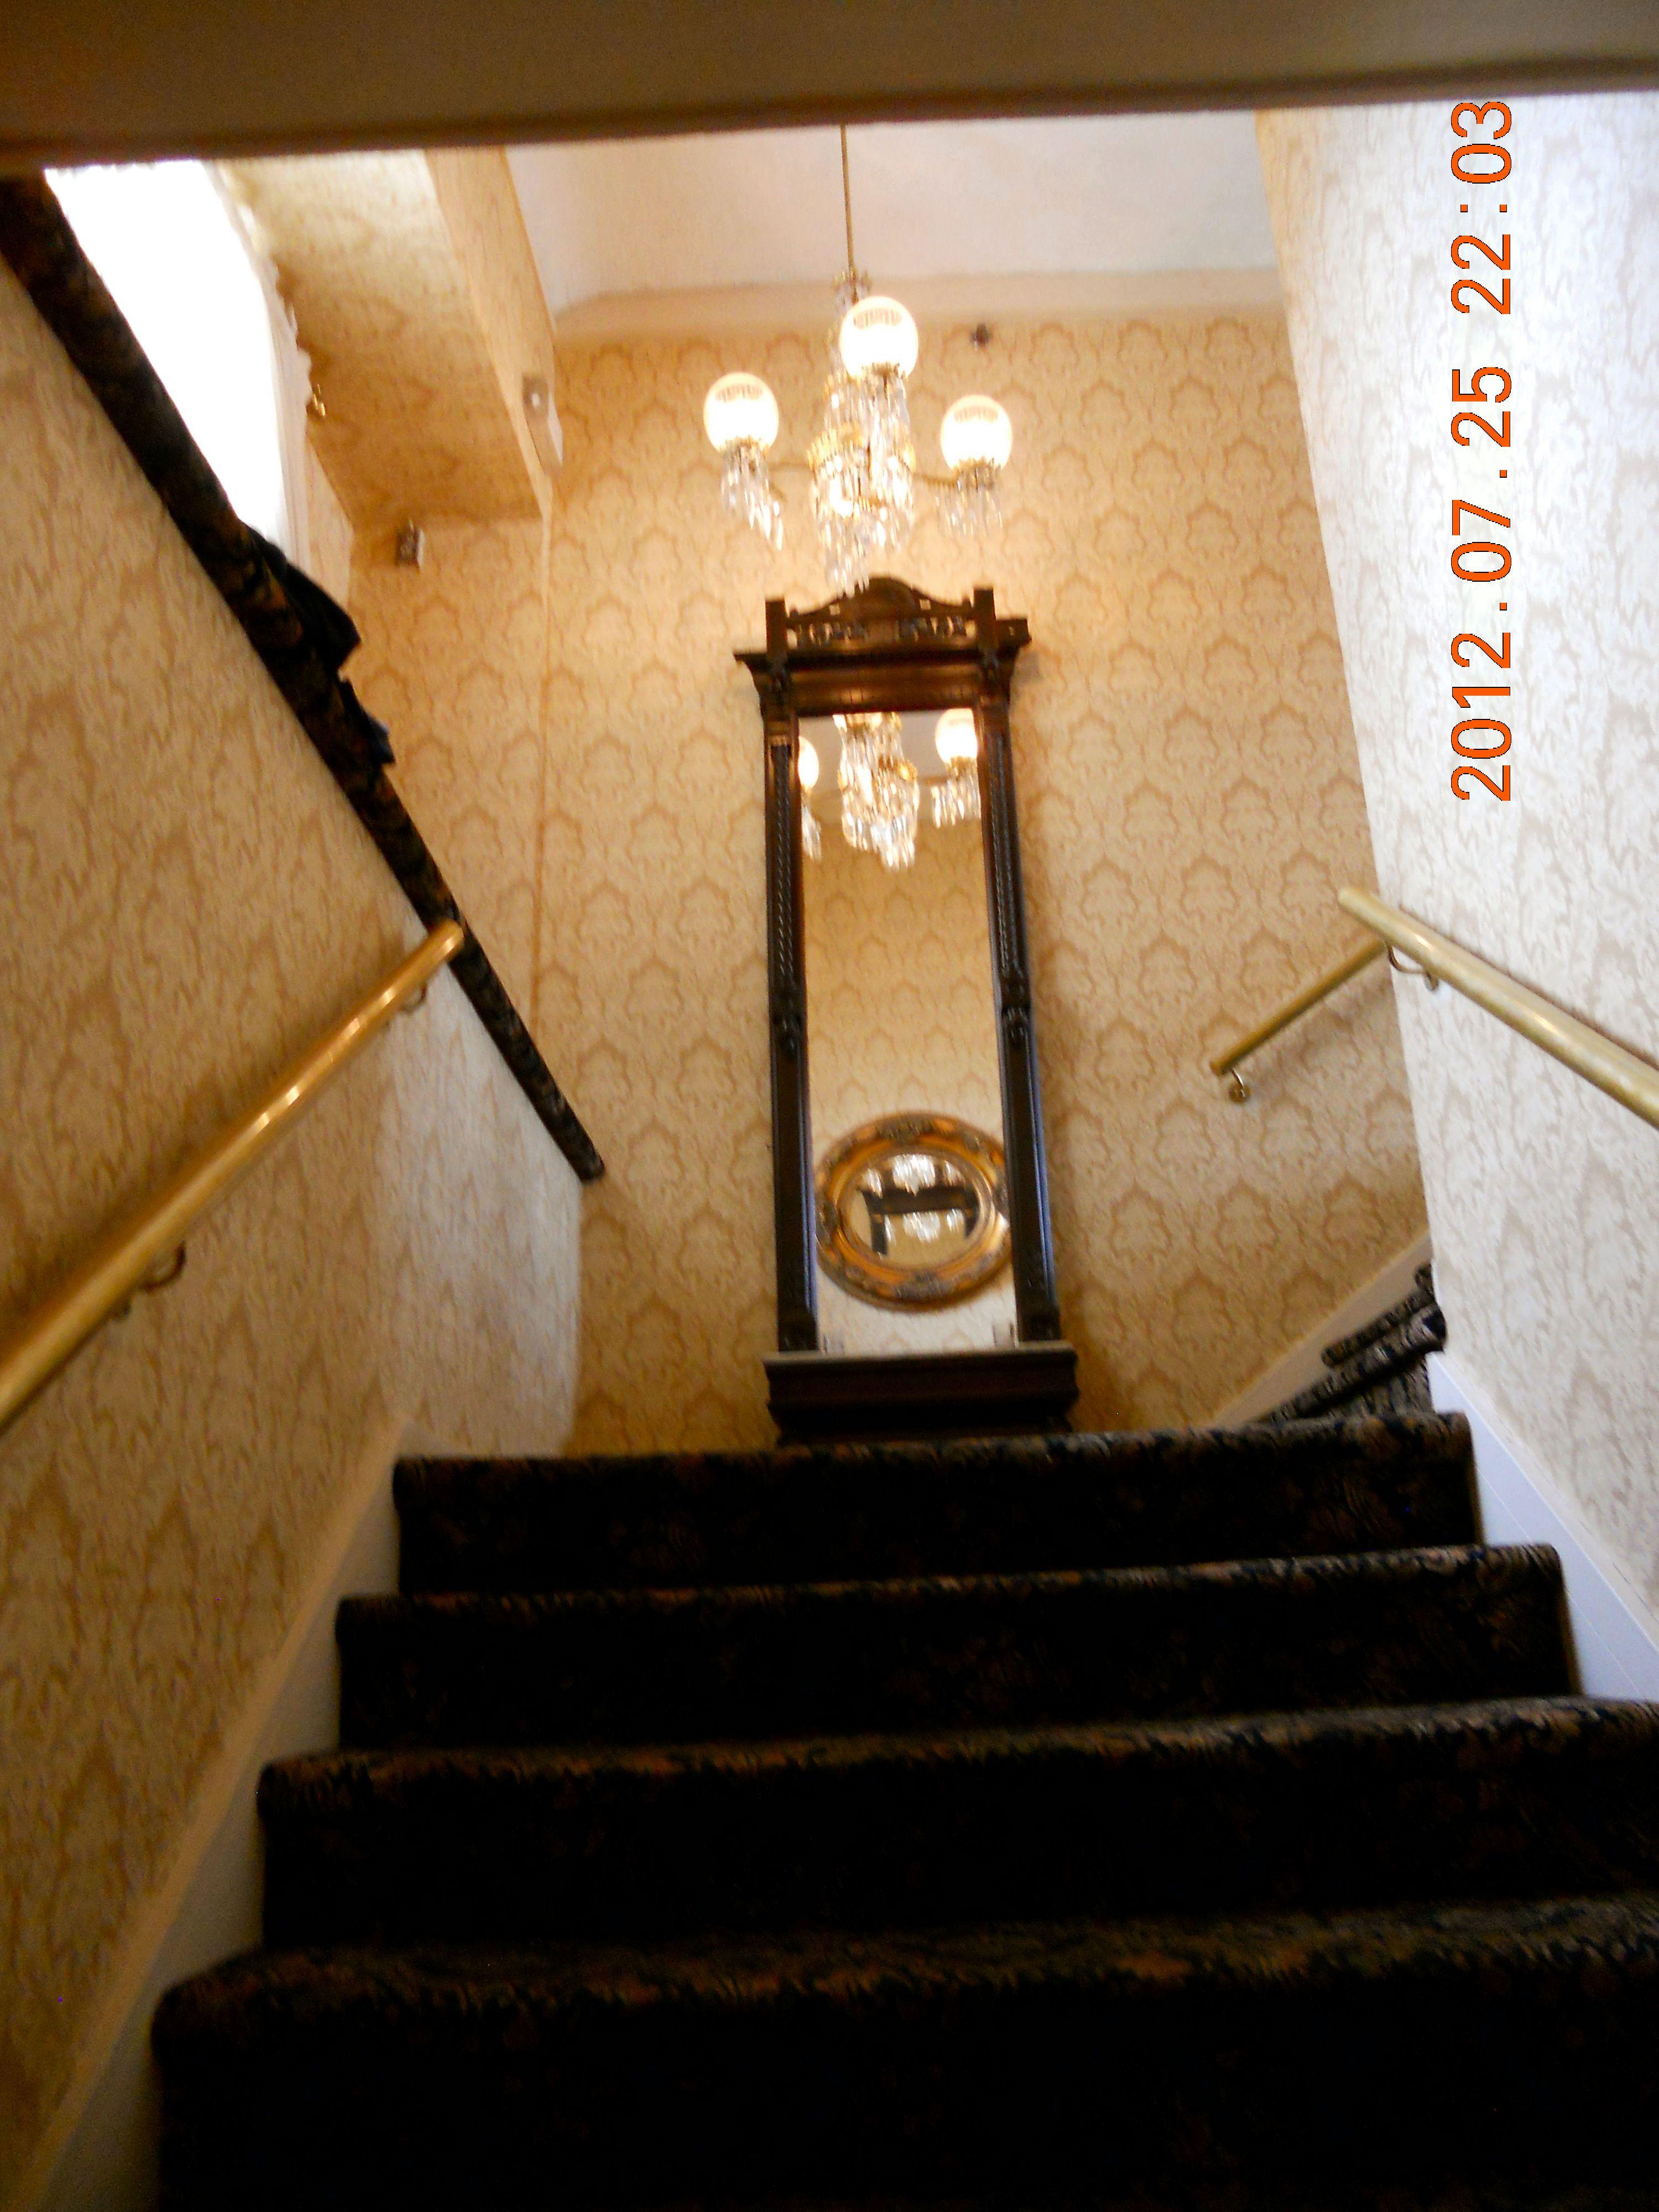 Grand staircase interior lake mohawk country club lake mohawk